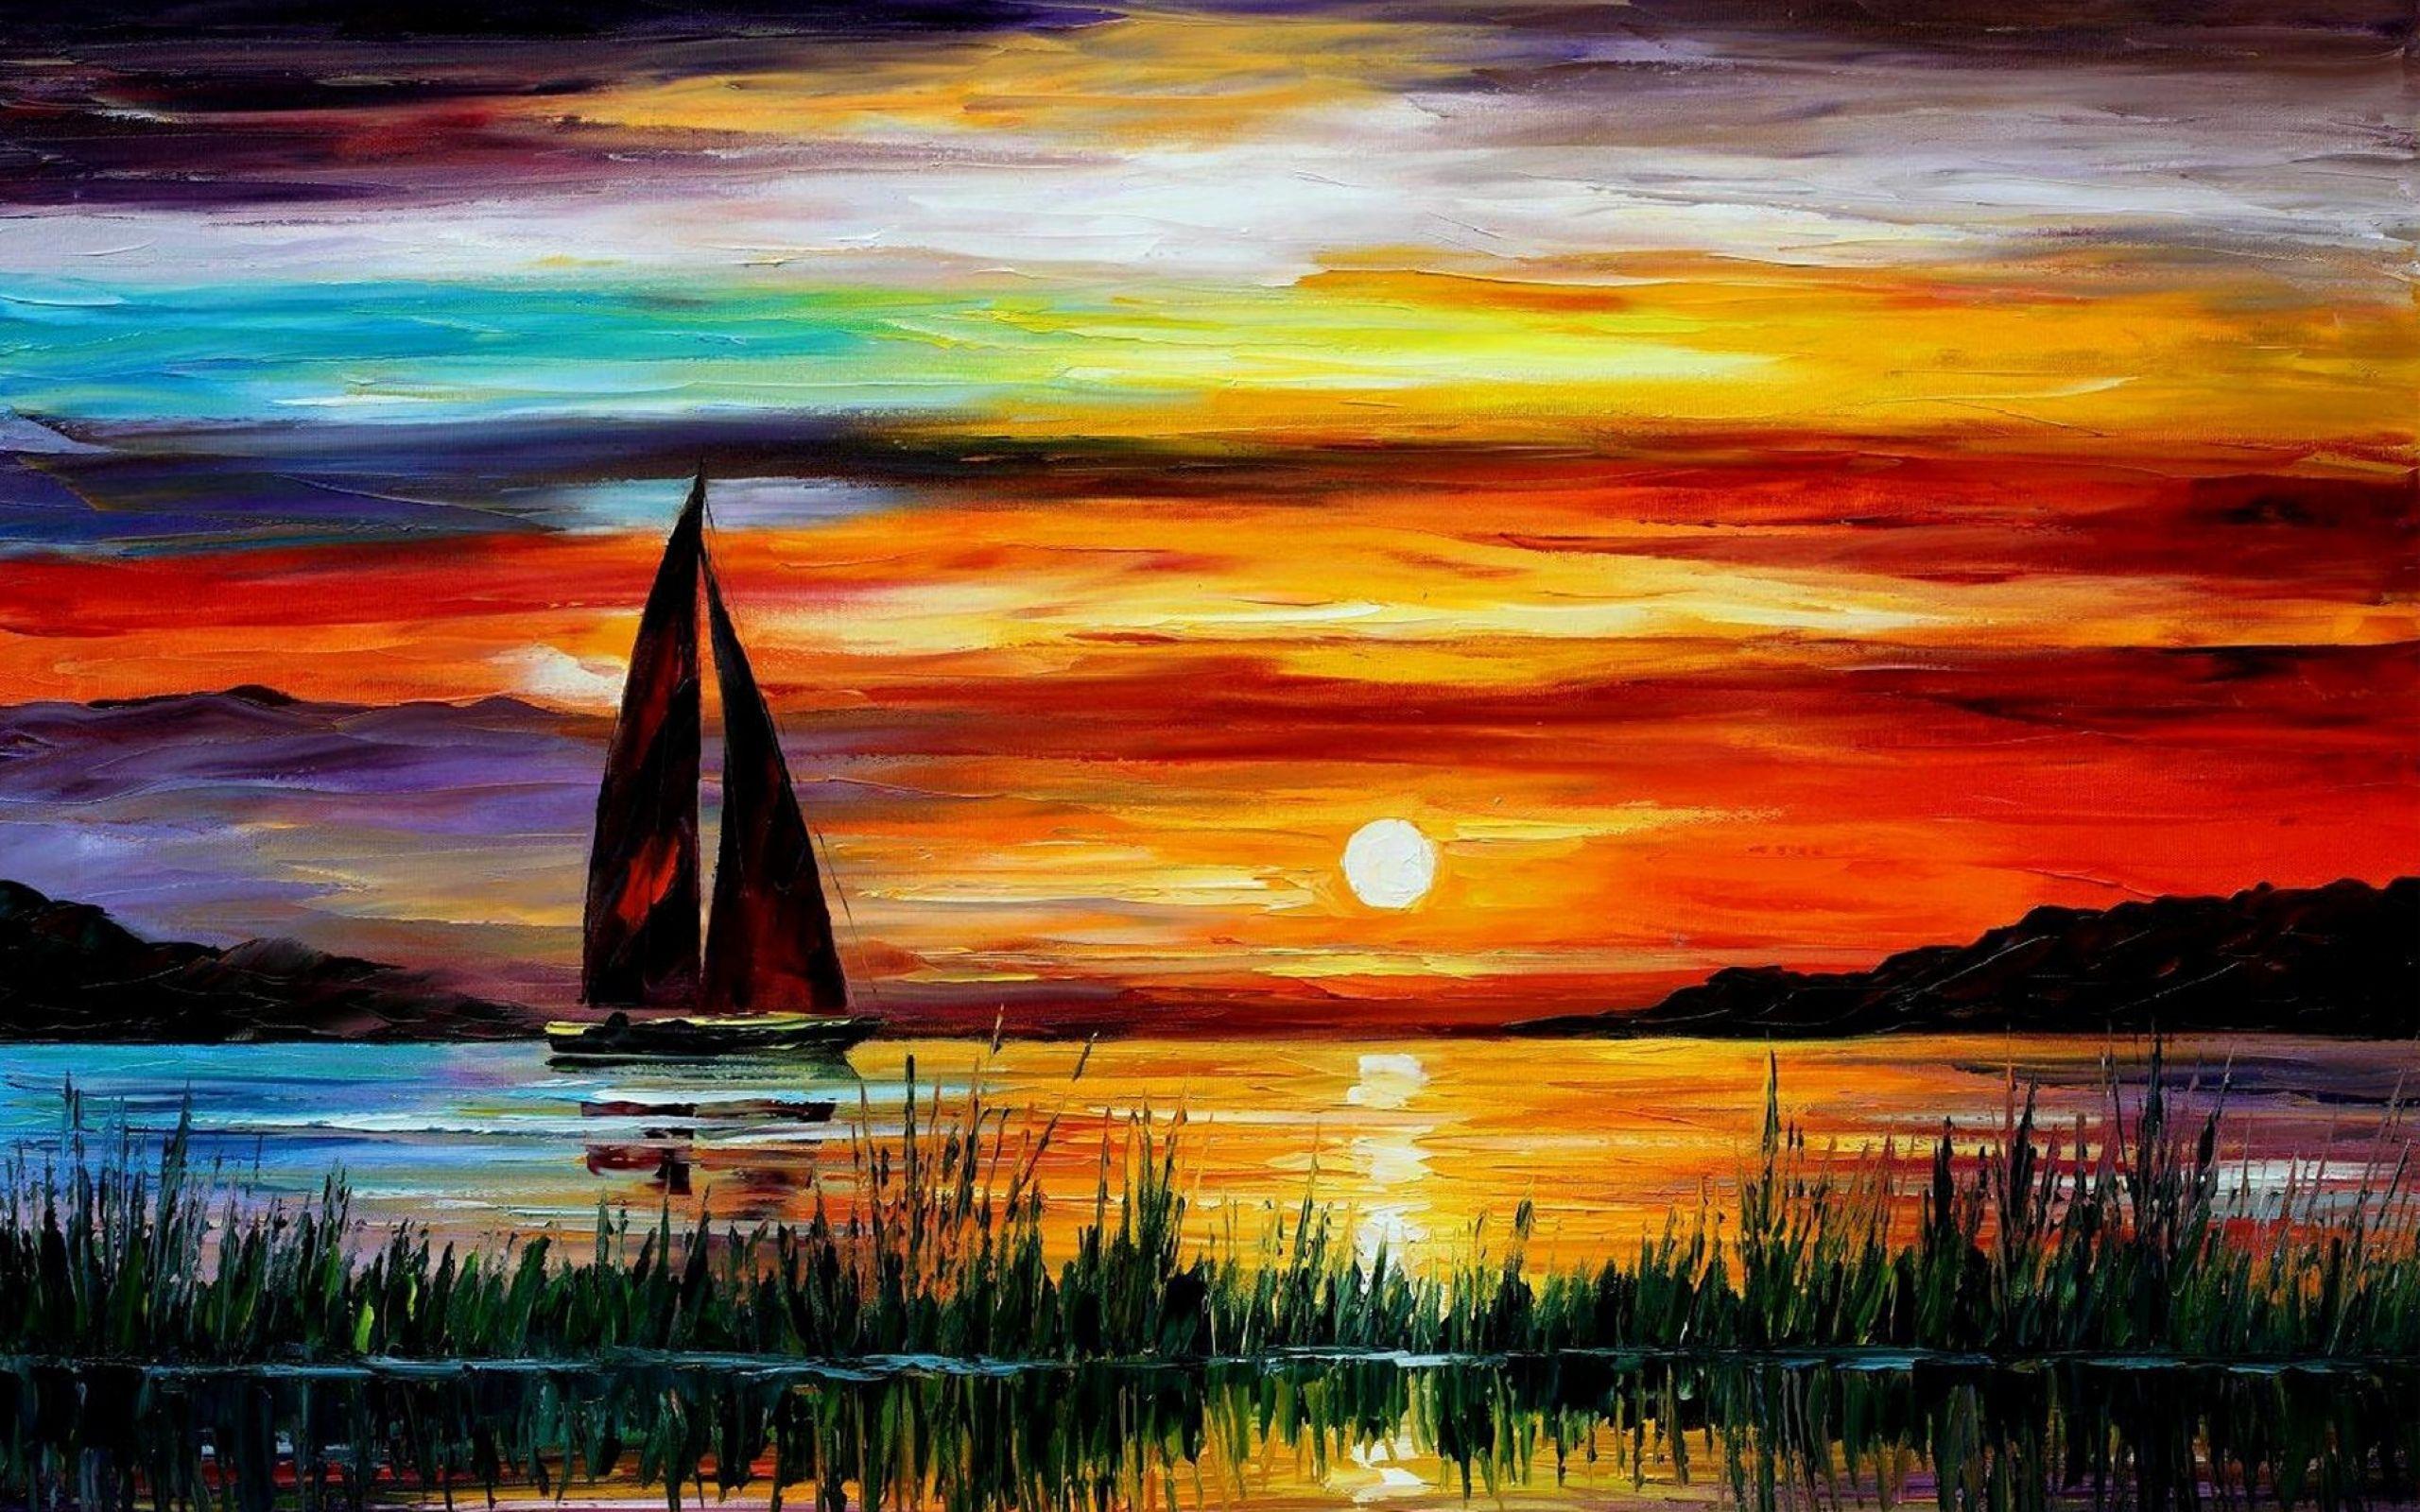 Sunset Paintings Leonid Afremov Sailboats Oil Painting 1900x1200